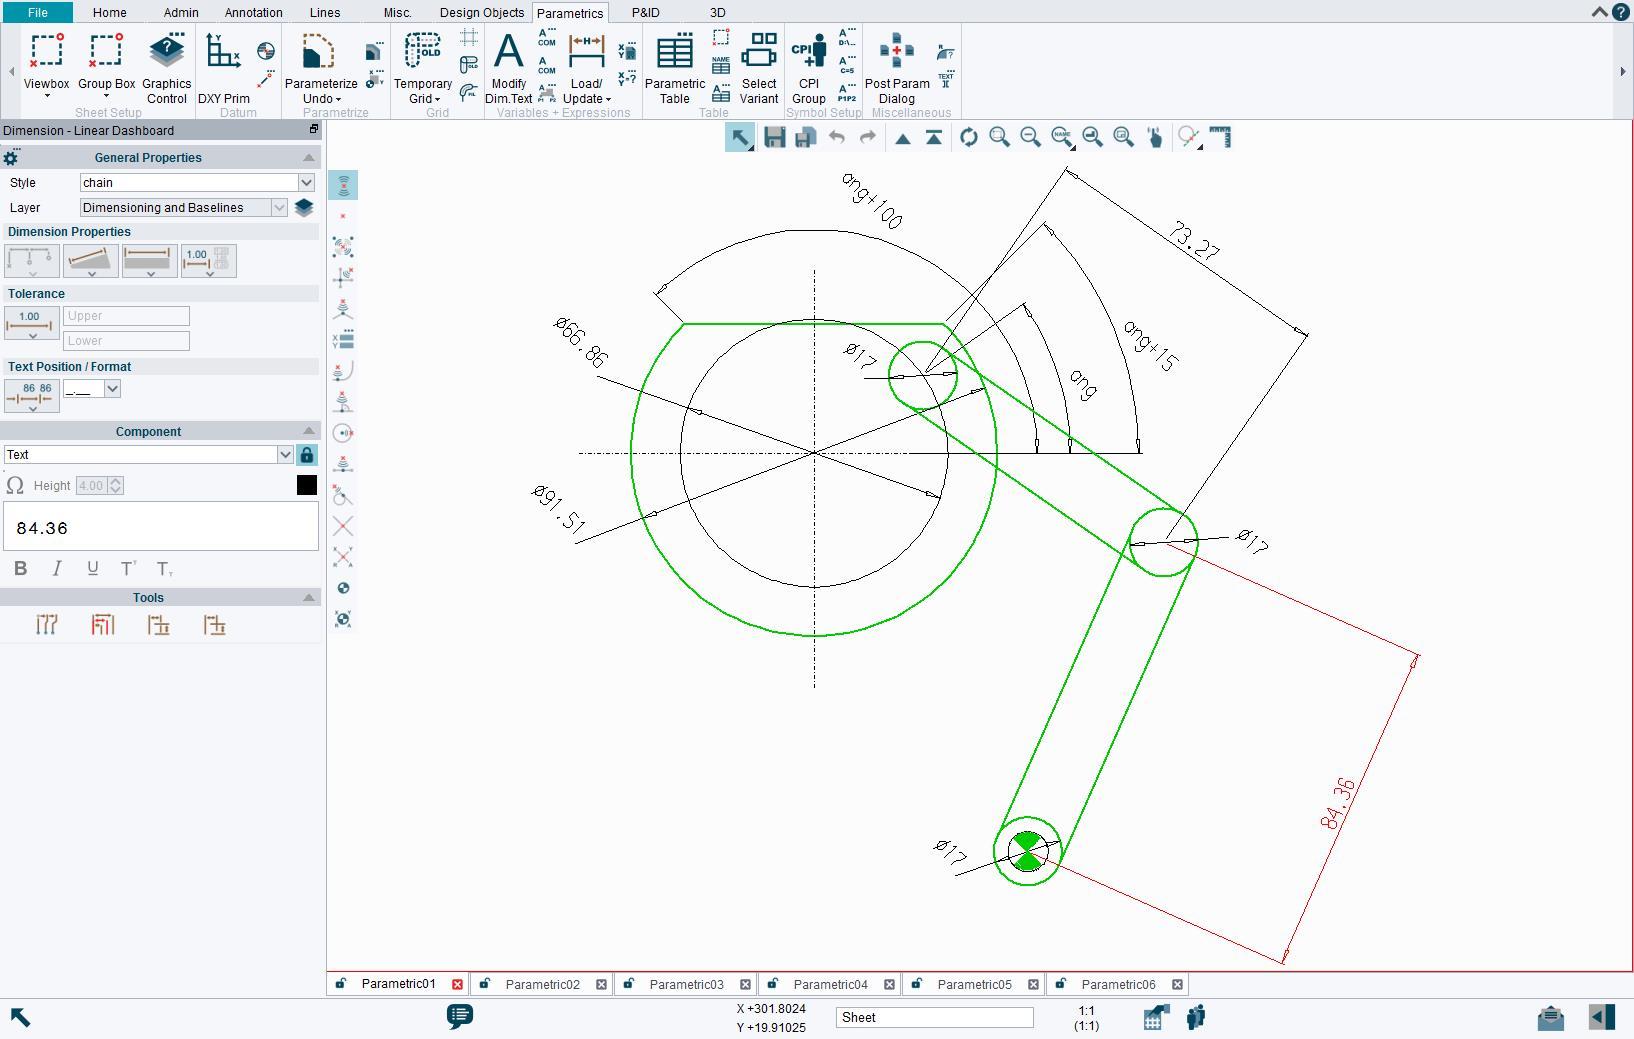 Automate manual design, simulation and testing processes